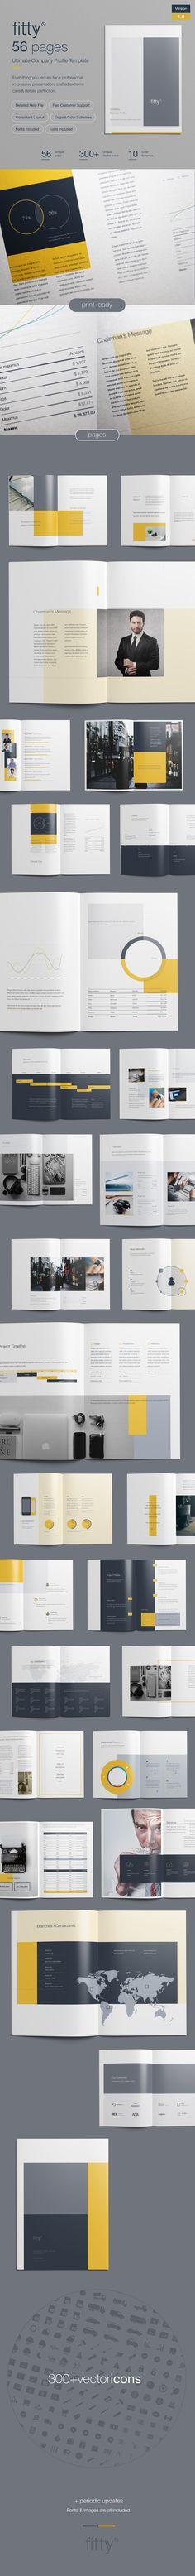 Free Company Profile Print Template - Theme Raid